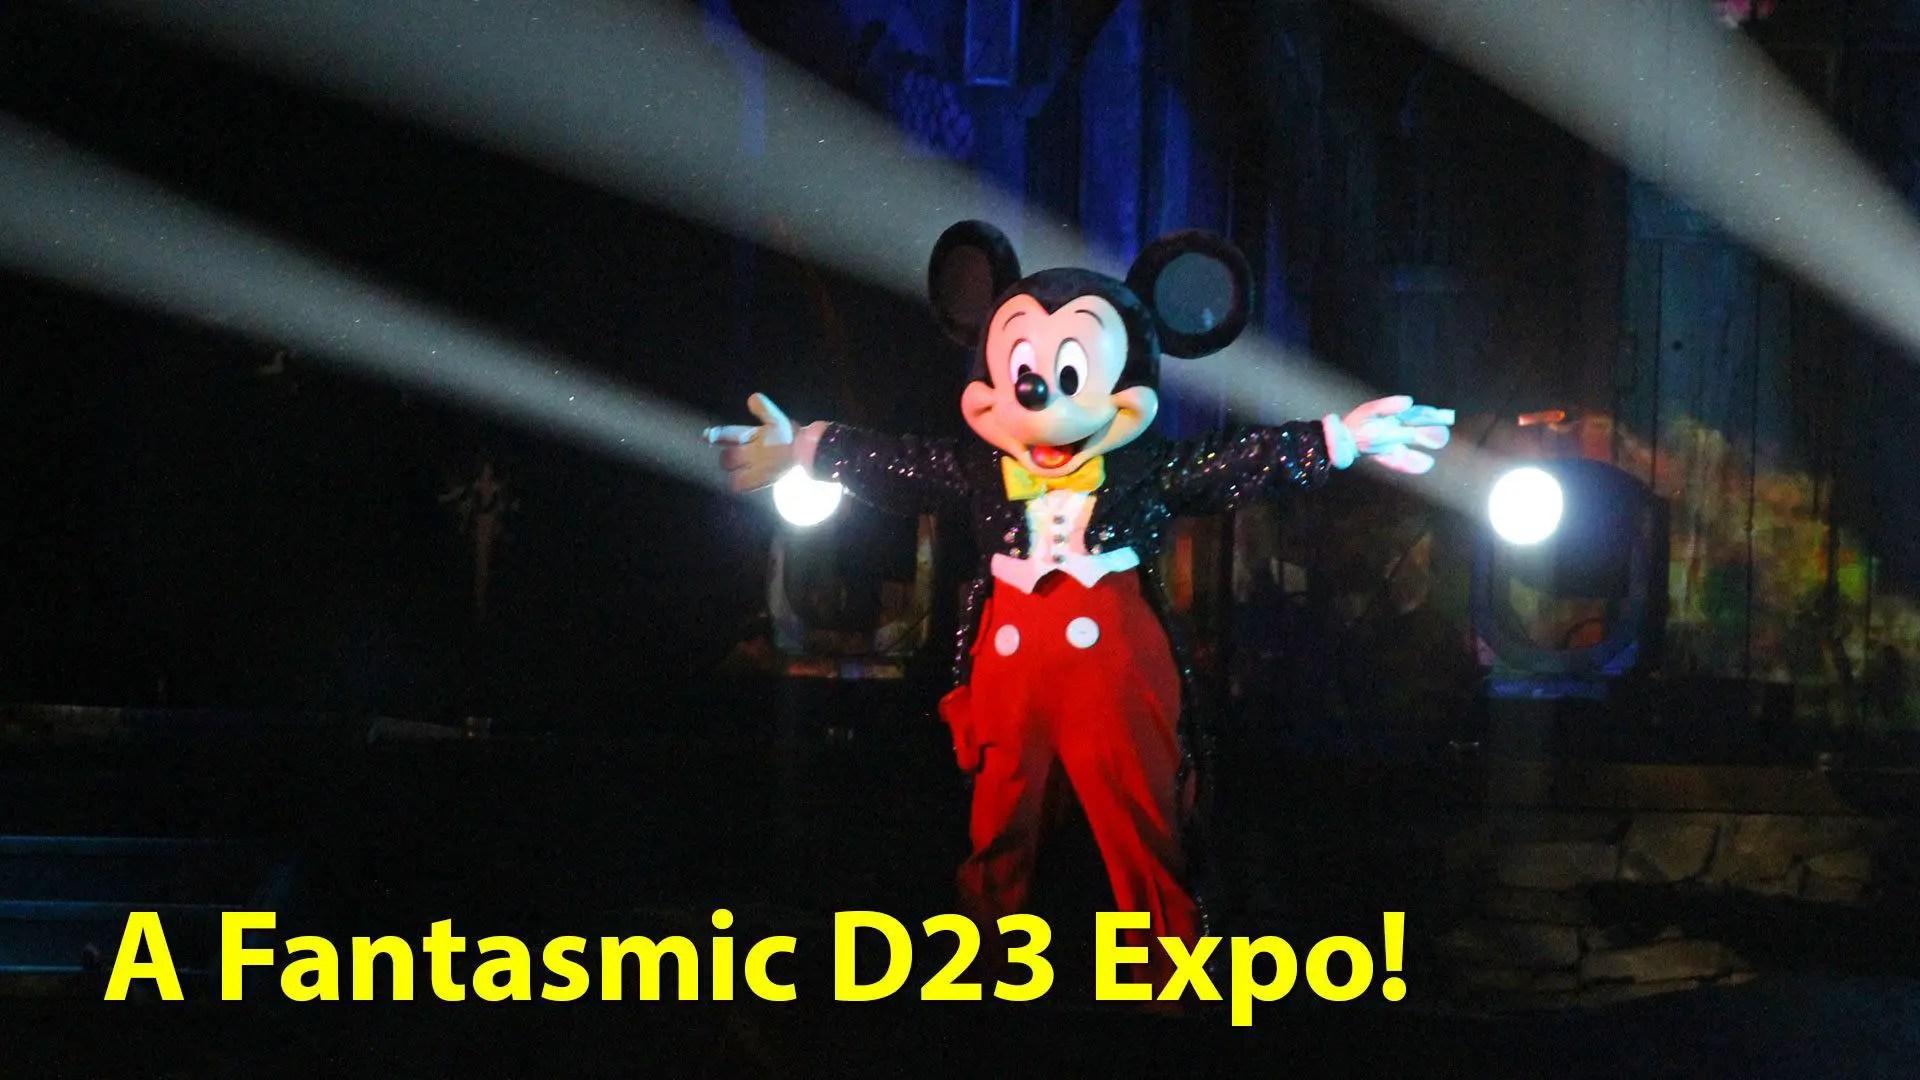 A Fantasmic D23 Expo! - Geeks Corner - Episode 642